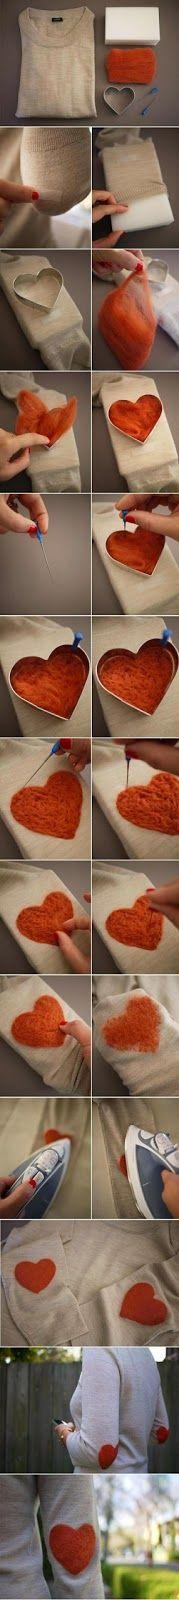 Portal de Manualidades: Decorar un suéter con fieltro